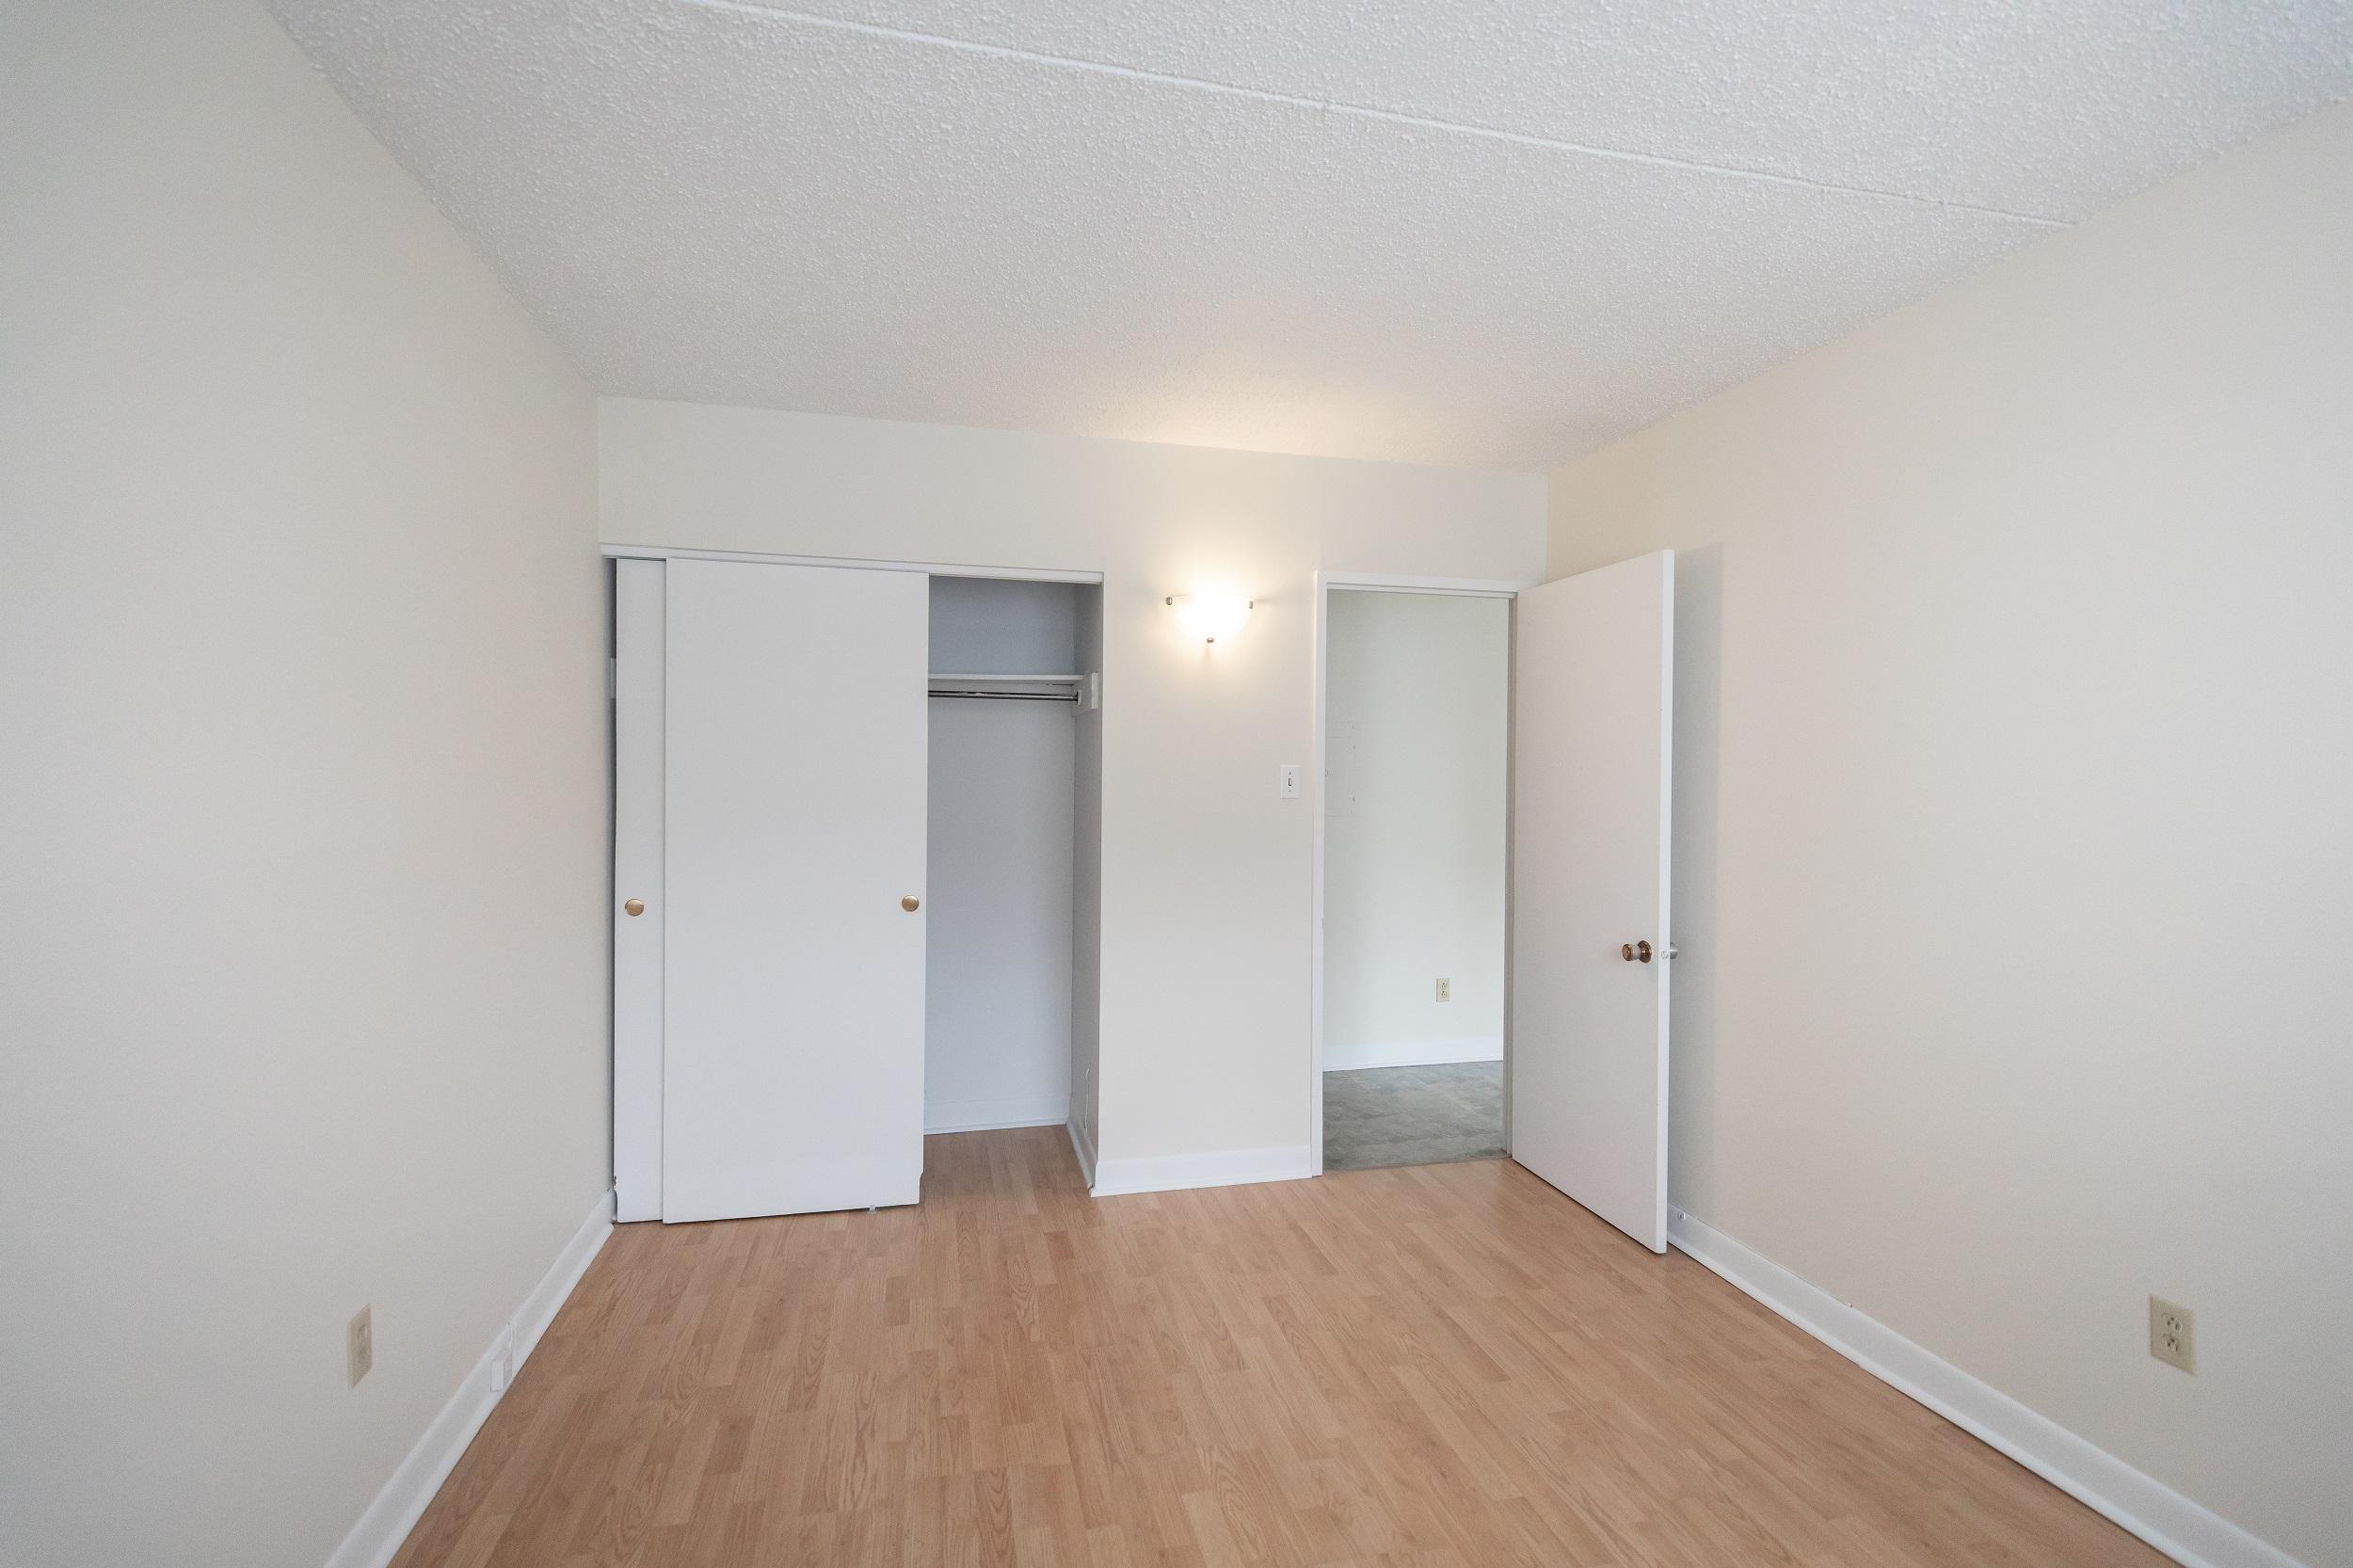 1 bedroom Apartments for rent in Quebec City at Degrandville - Photo 08 - RentQuebecApartments – L401557